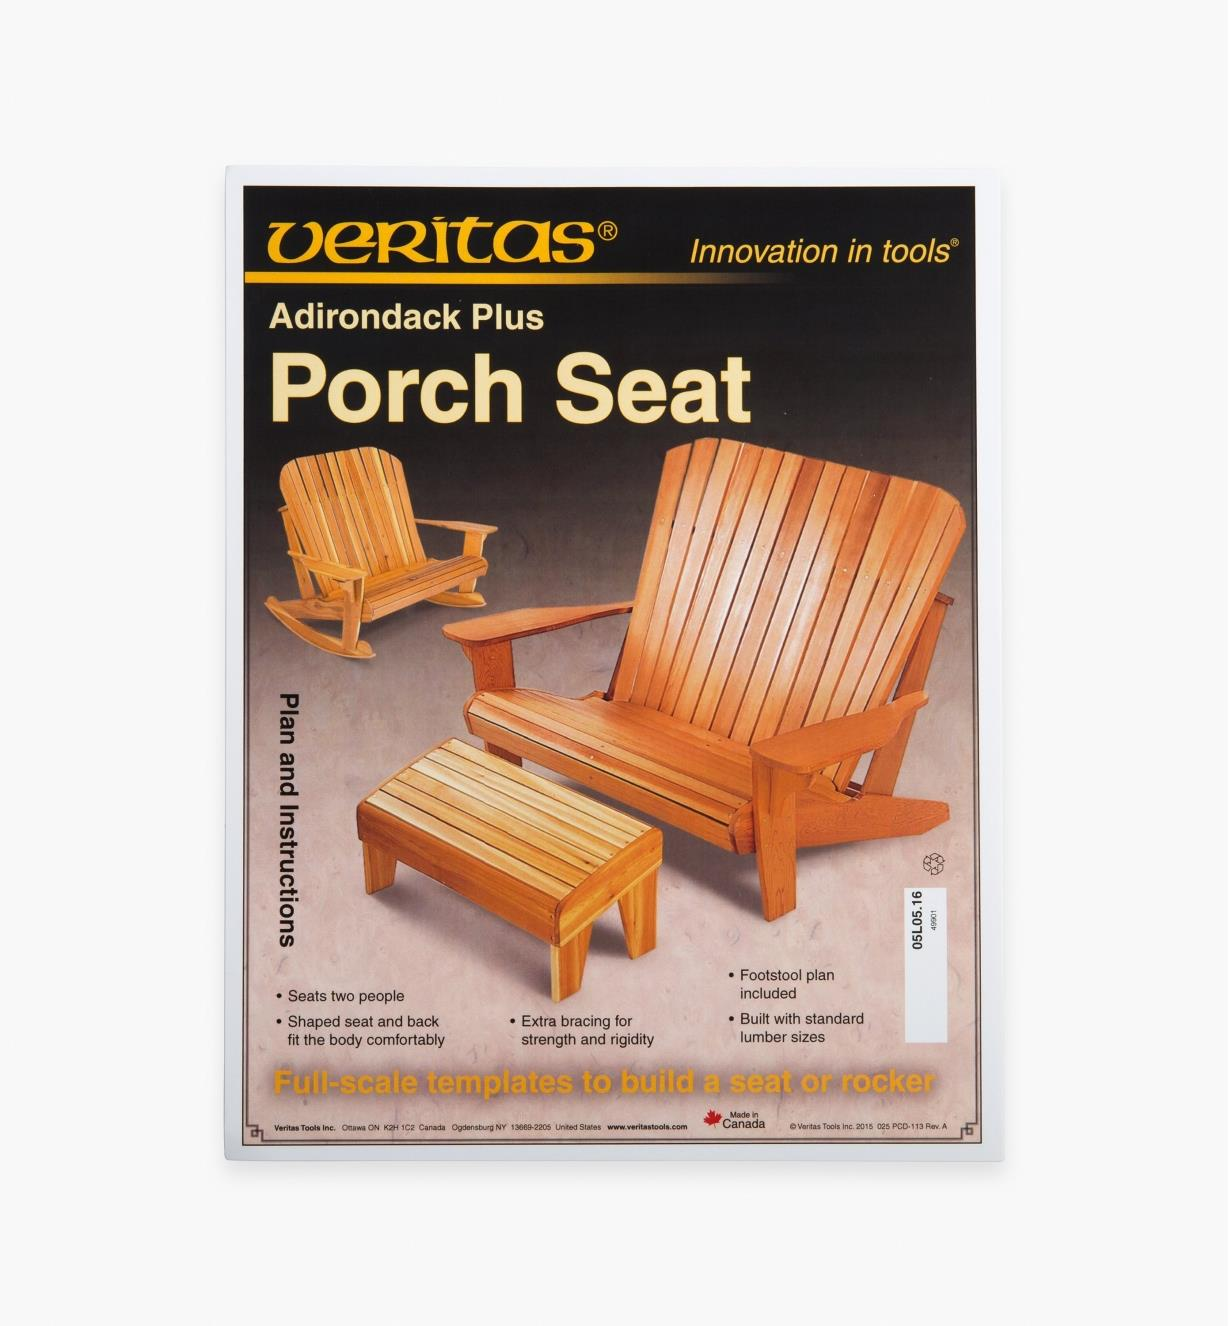 05L0516 - Adirondack Plus Seat/Rocker Plan